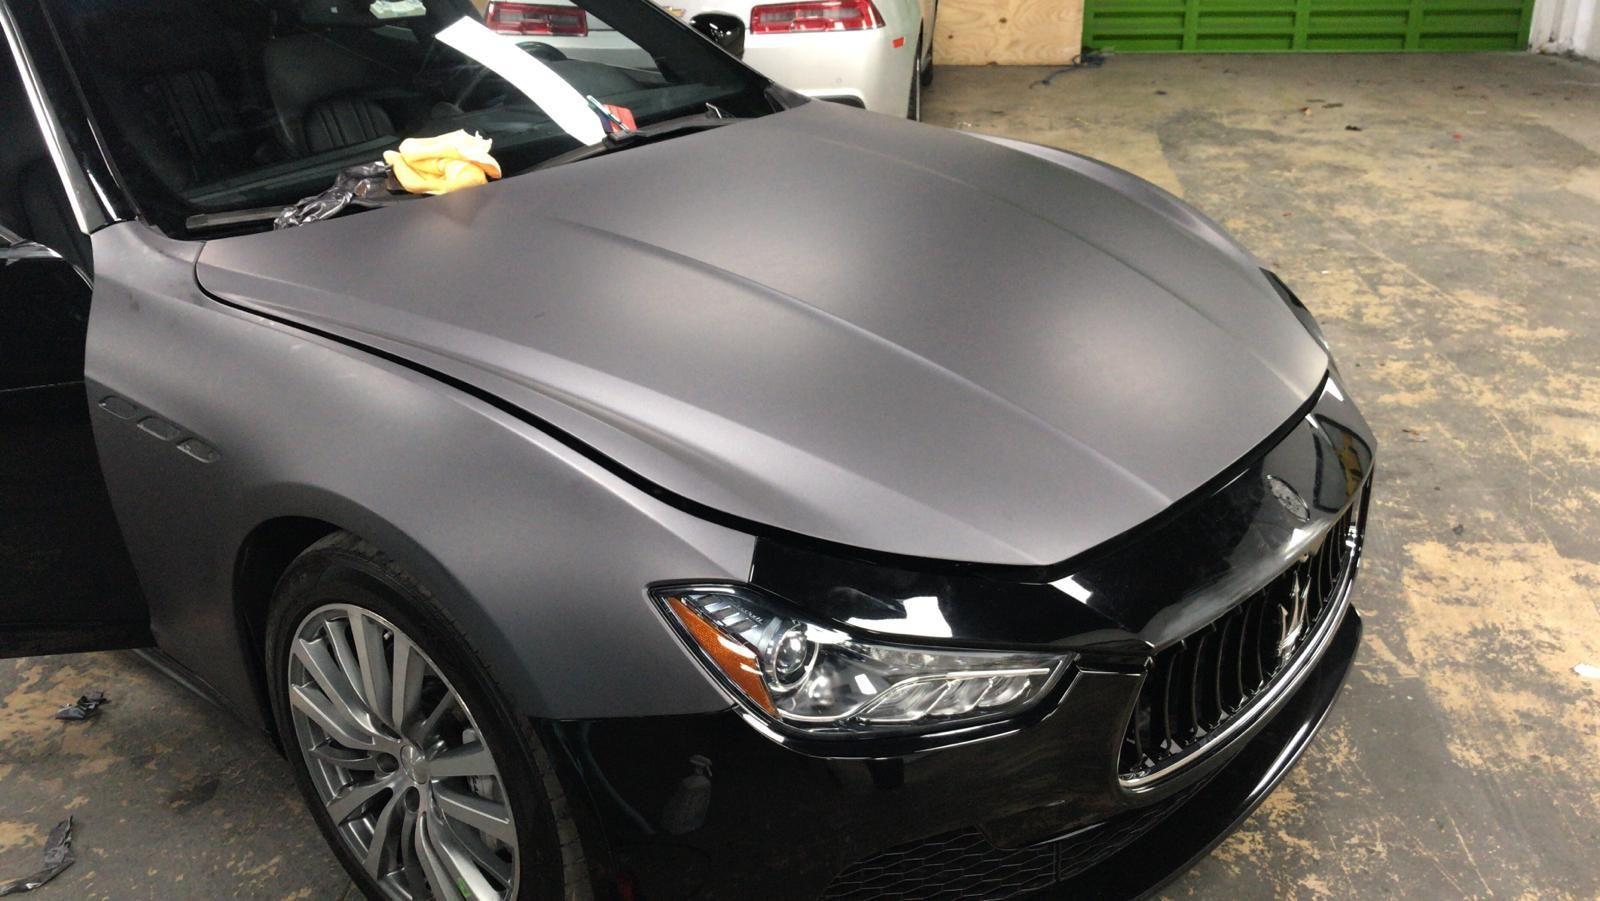 Matte Dark Grey Car Wraps Miami Car Wrap Car Boat Wraps